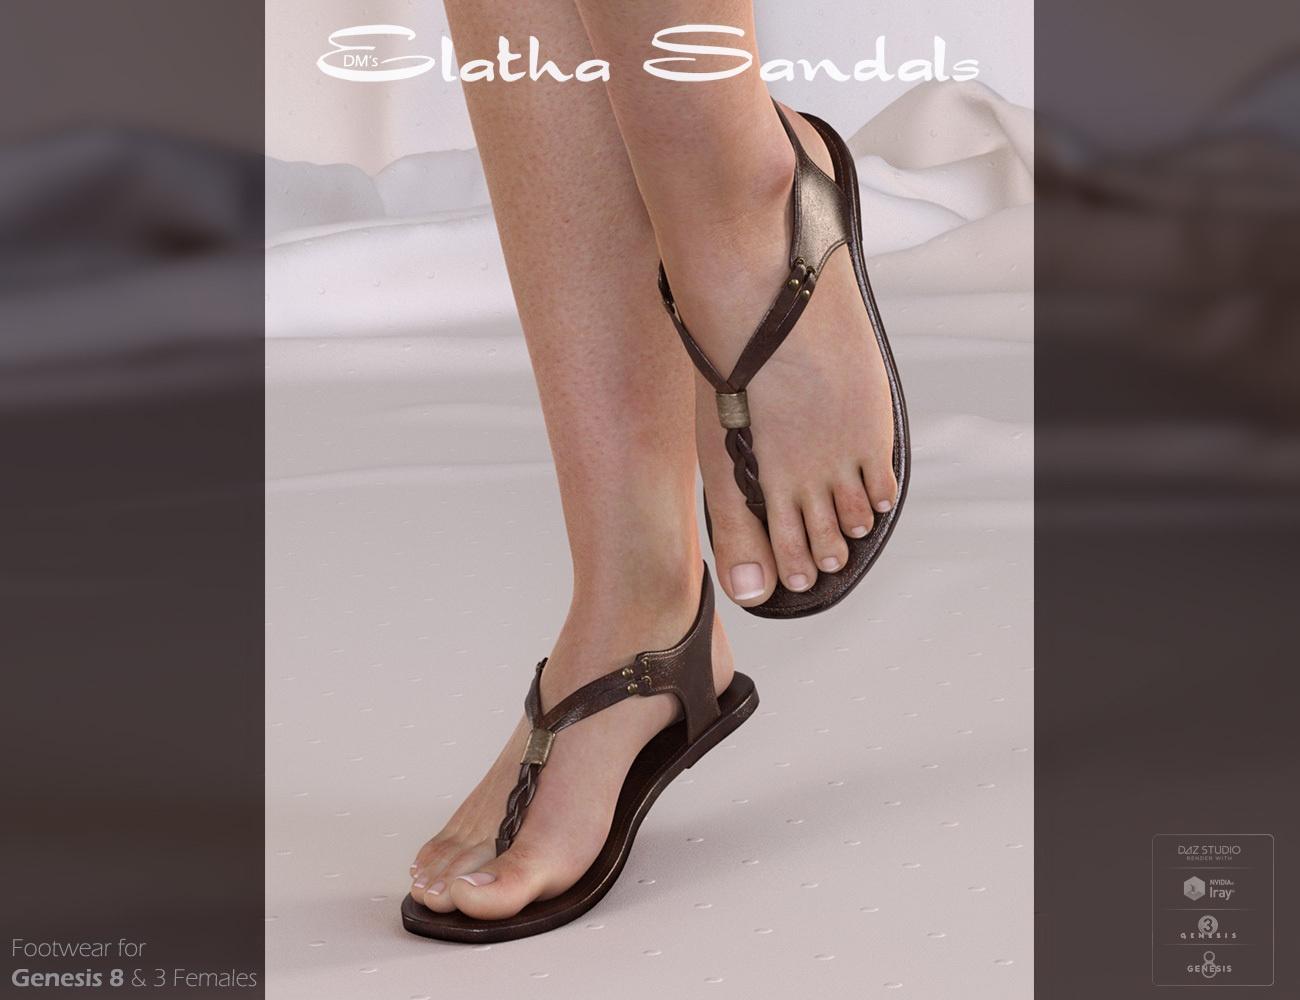 dms-elatha-sandals